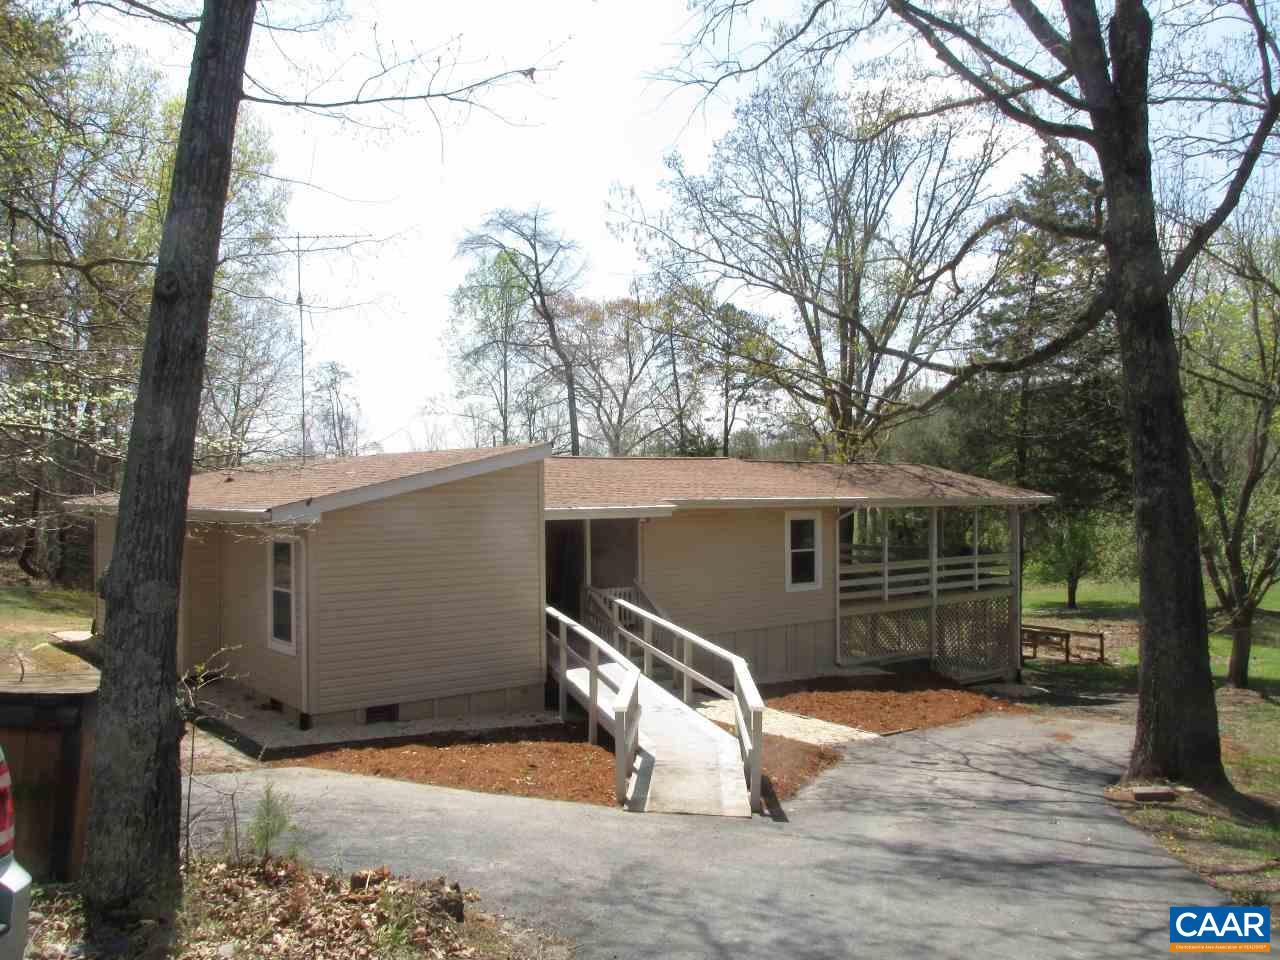 Property for sale at 694 MATTHEW MILL RD, Ruckersville,  VA 22968